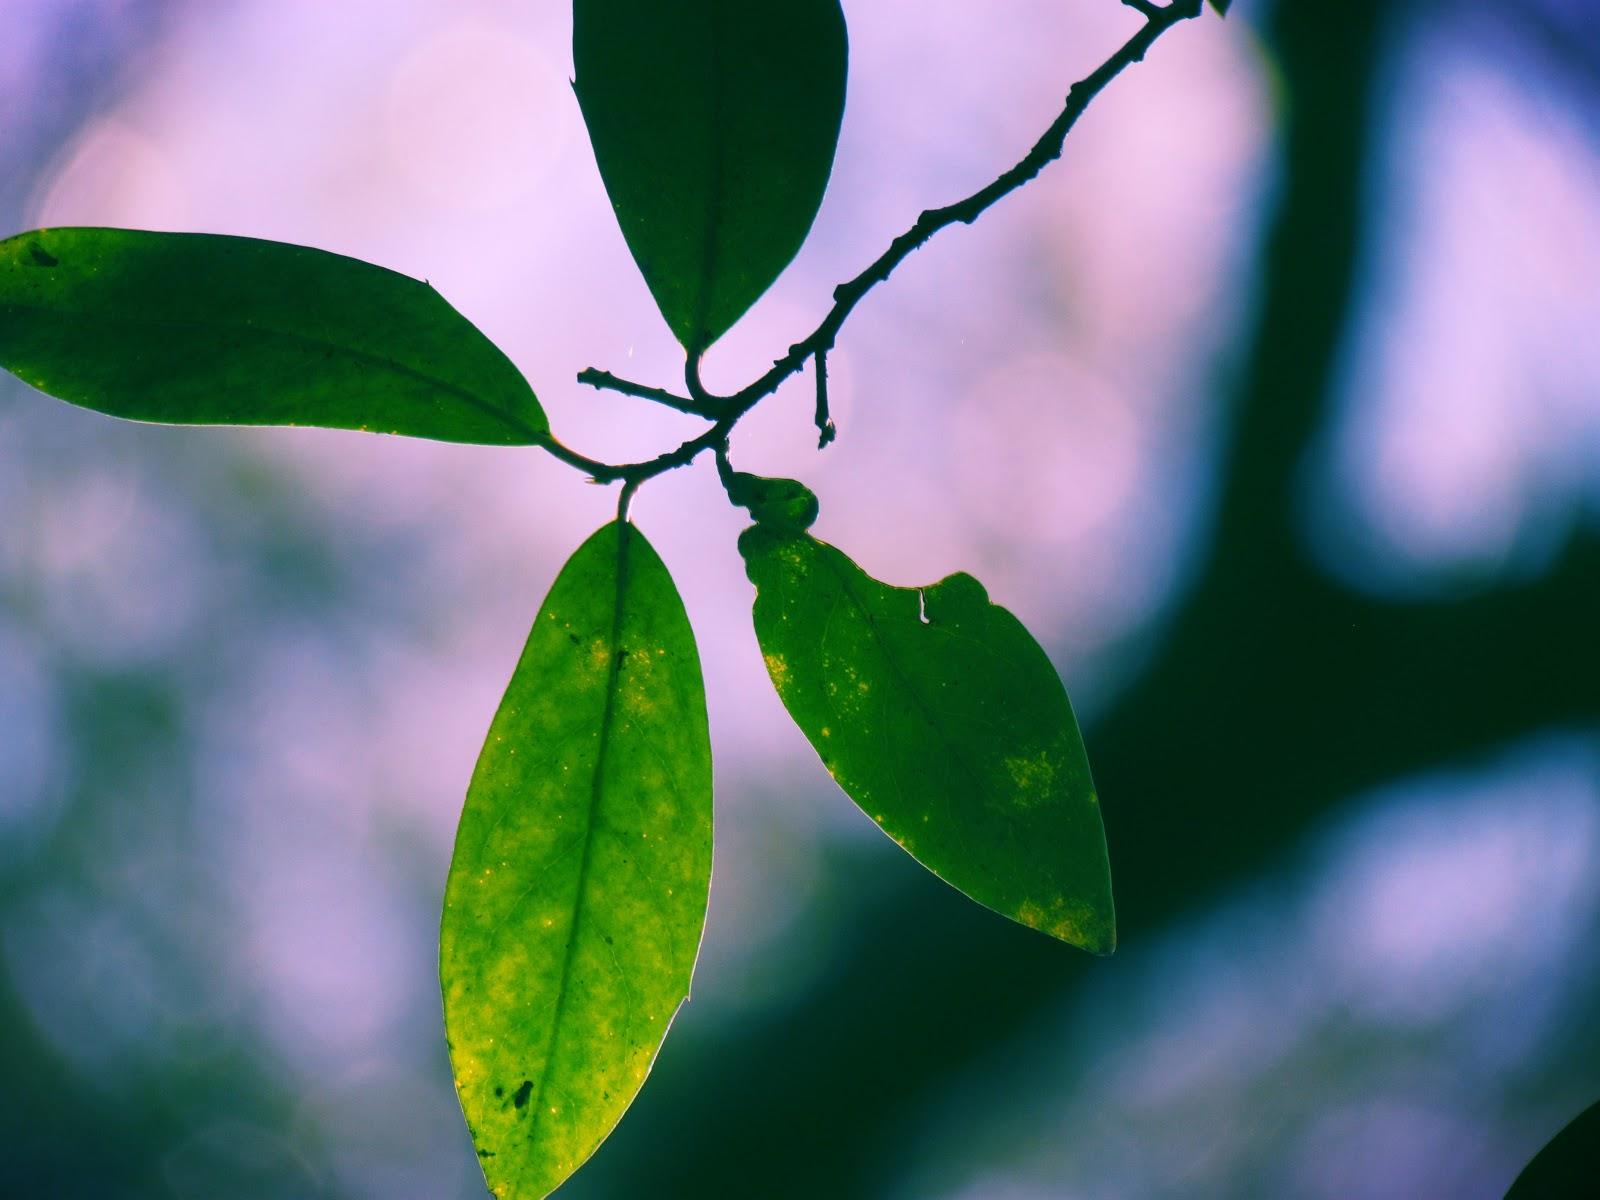 Green Leaf Macro Photography Lens Eternal Nature